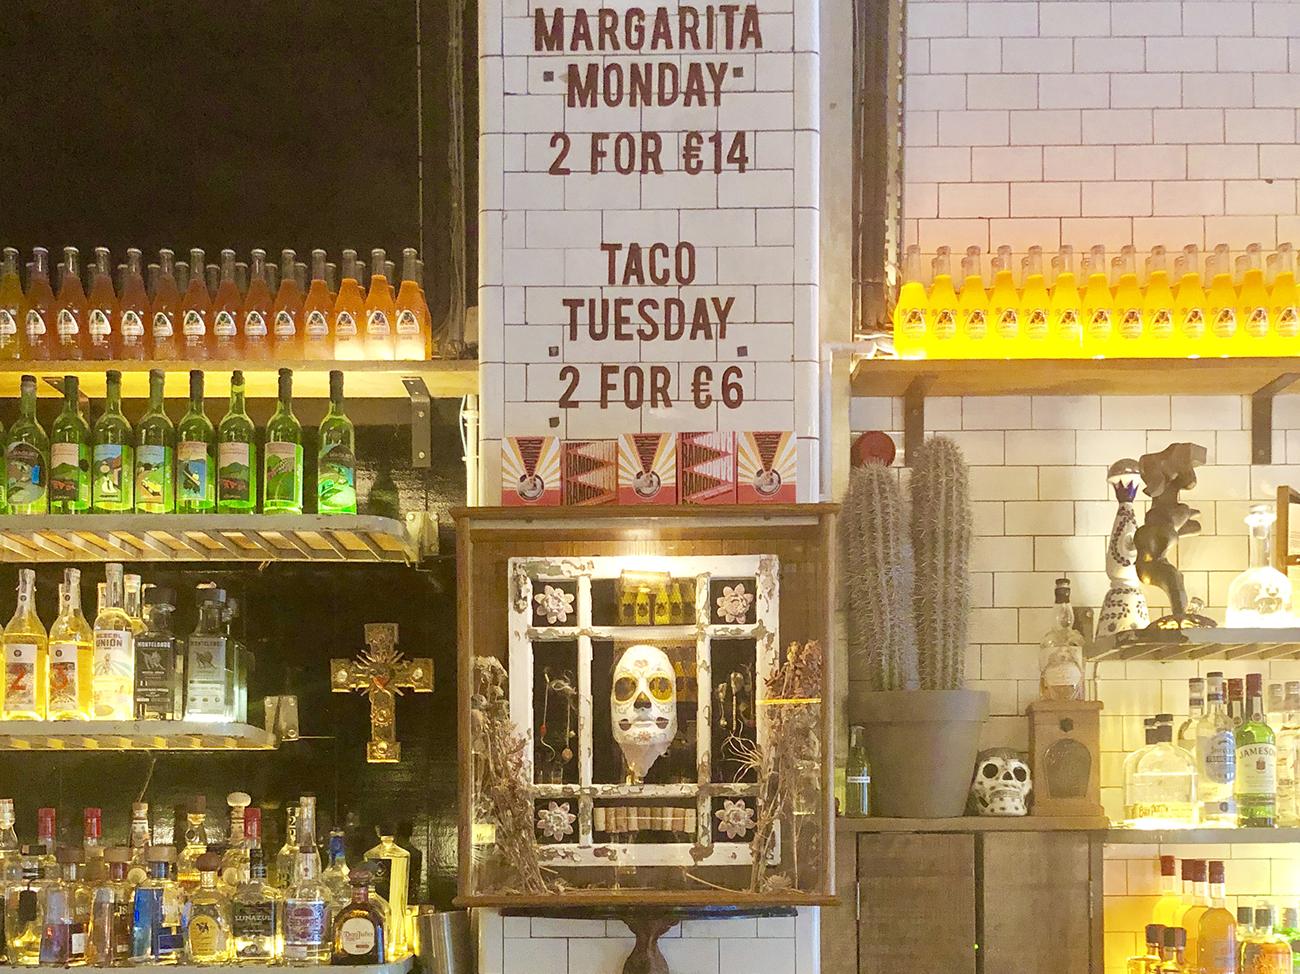 777 House Margarita Dublin